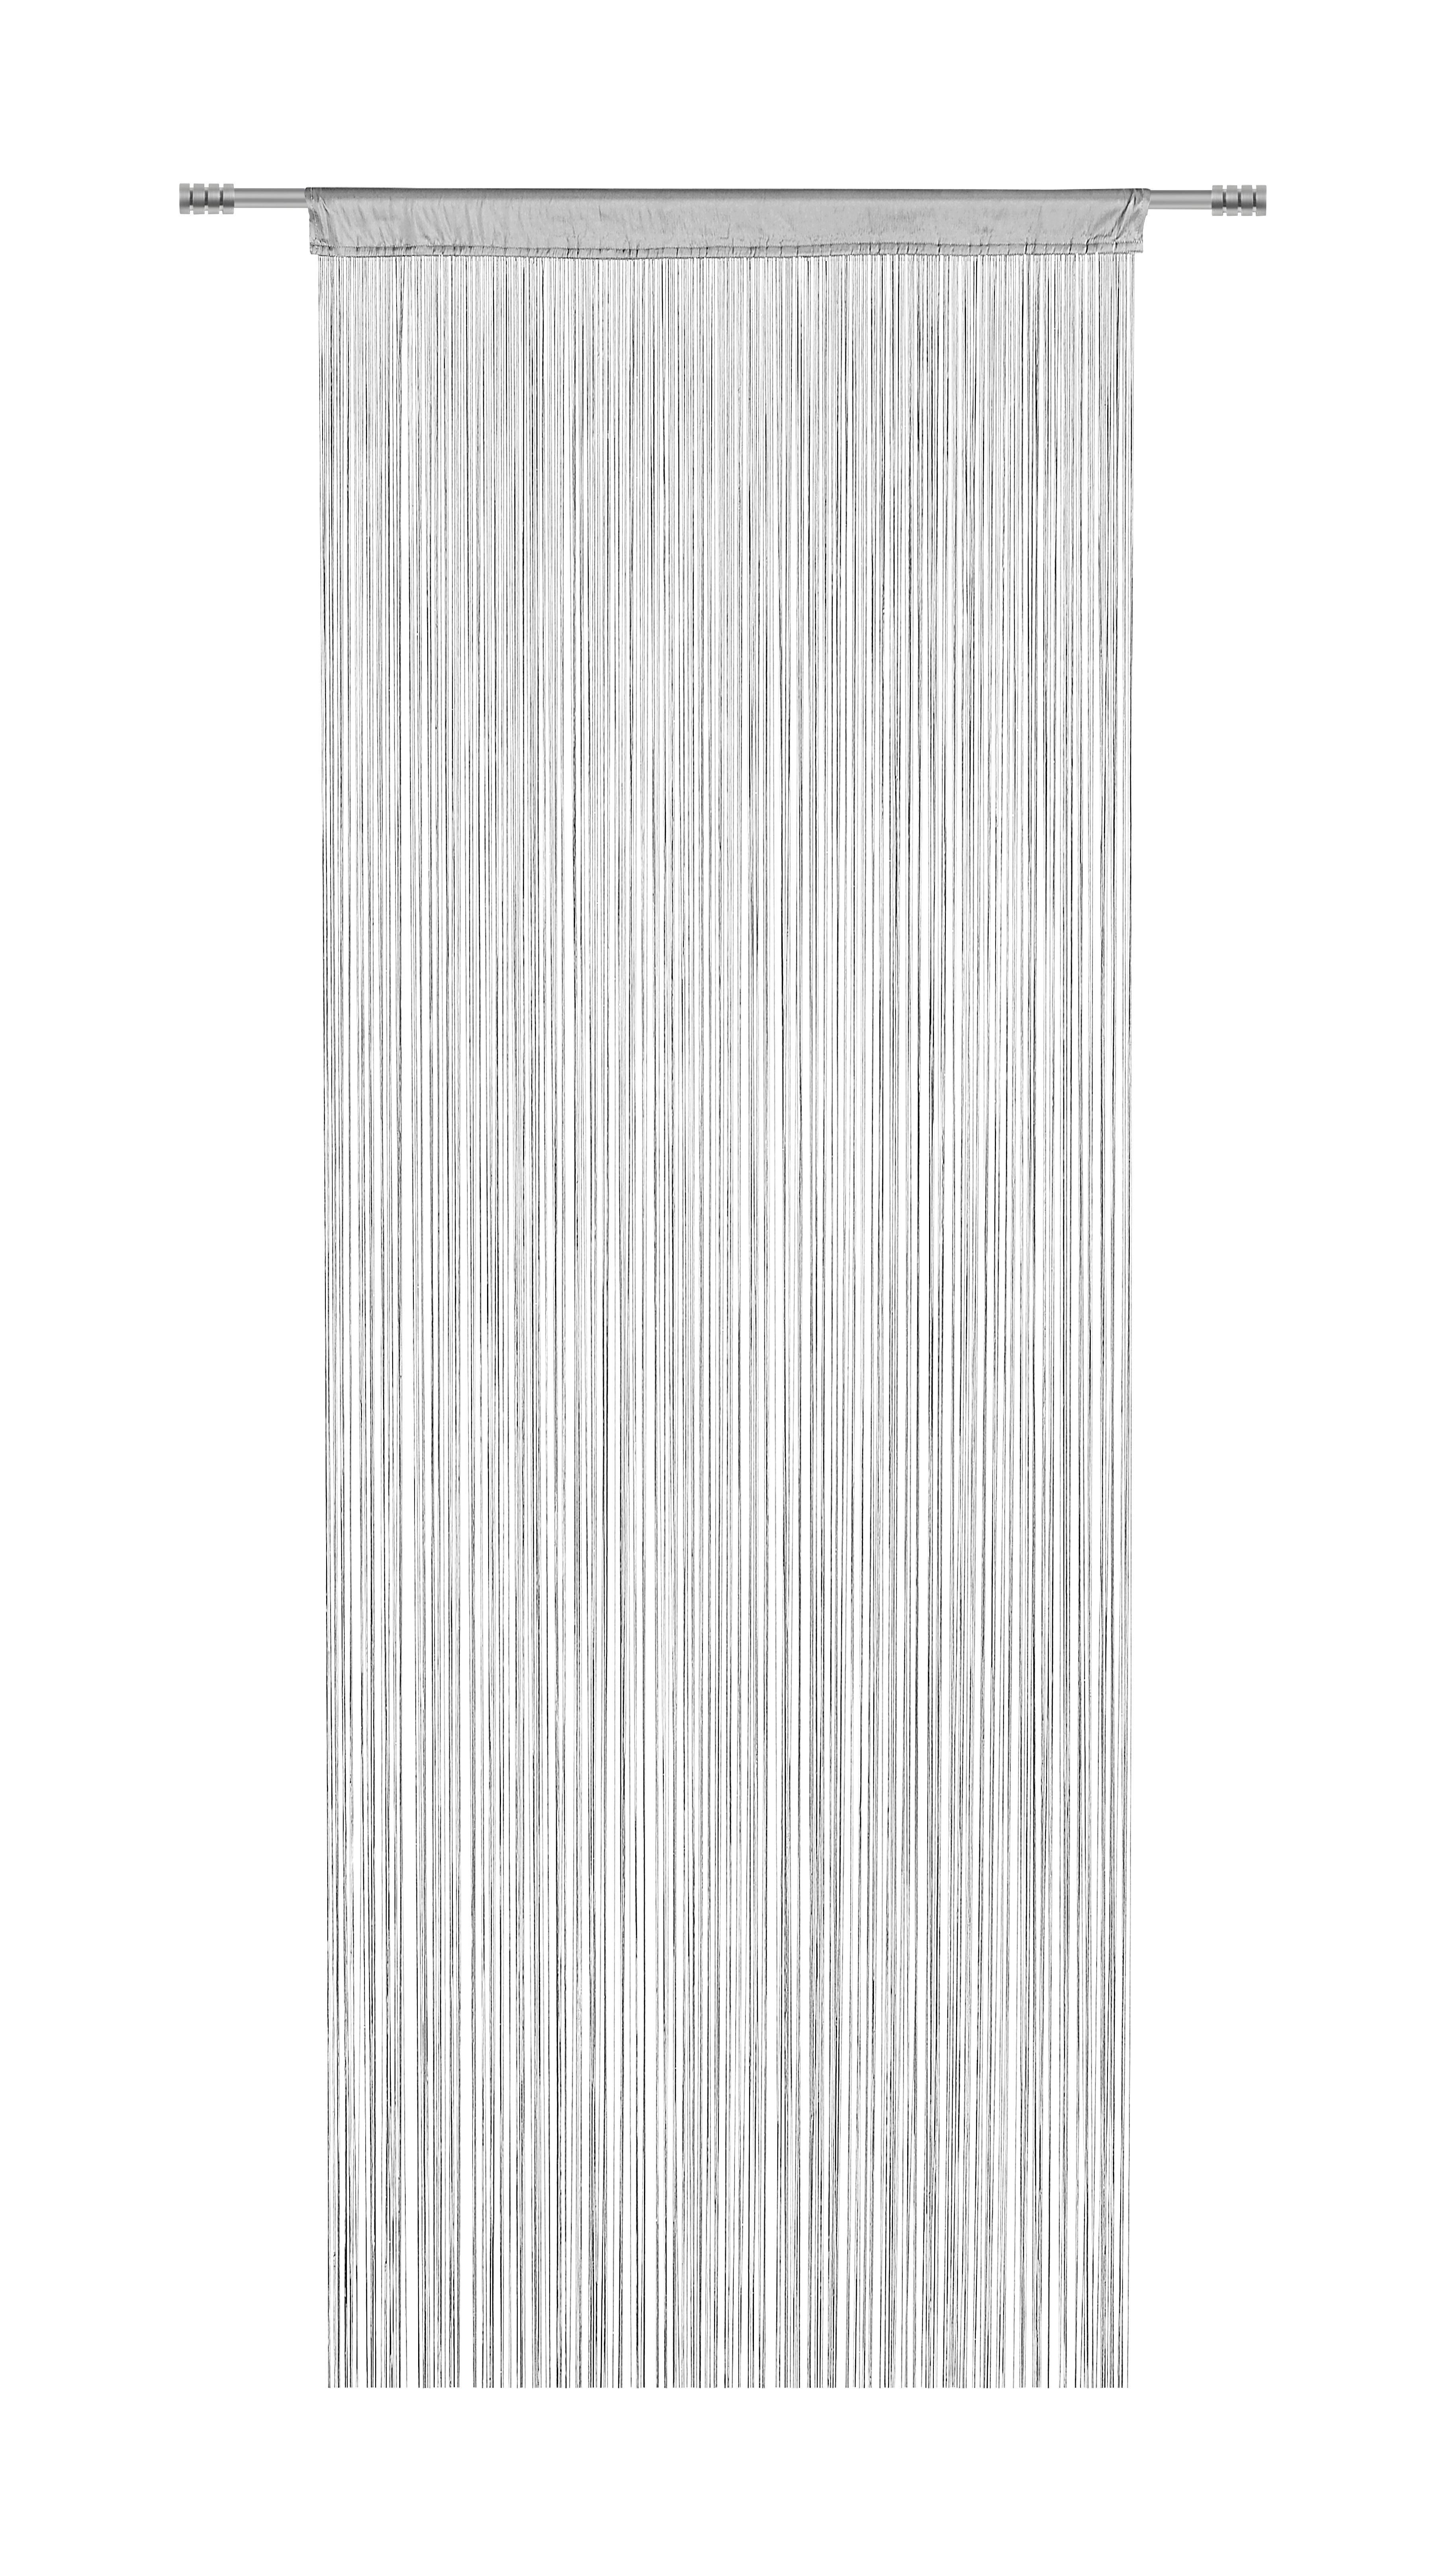 FADENSTORE  transparent  90/245 cm - Silberfarben, Basics, Textil (90/245cm) - BOXXX